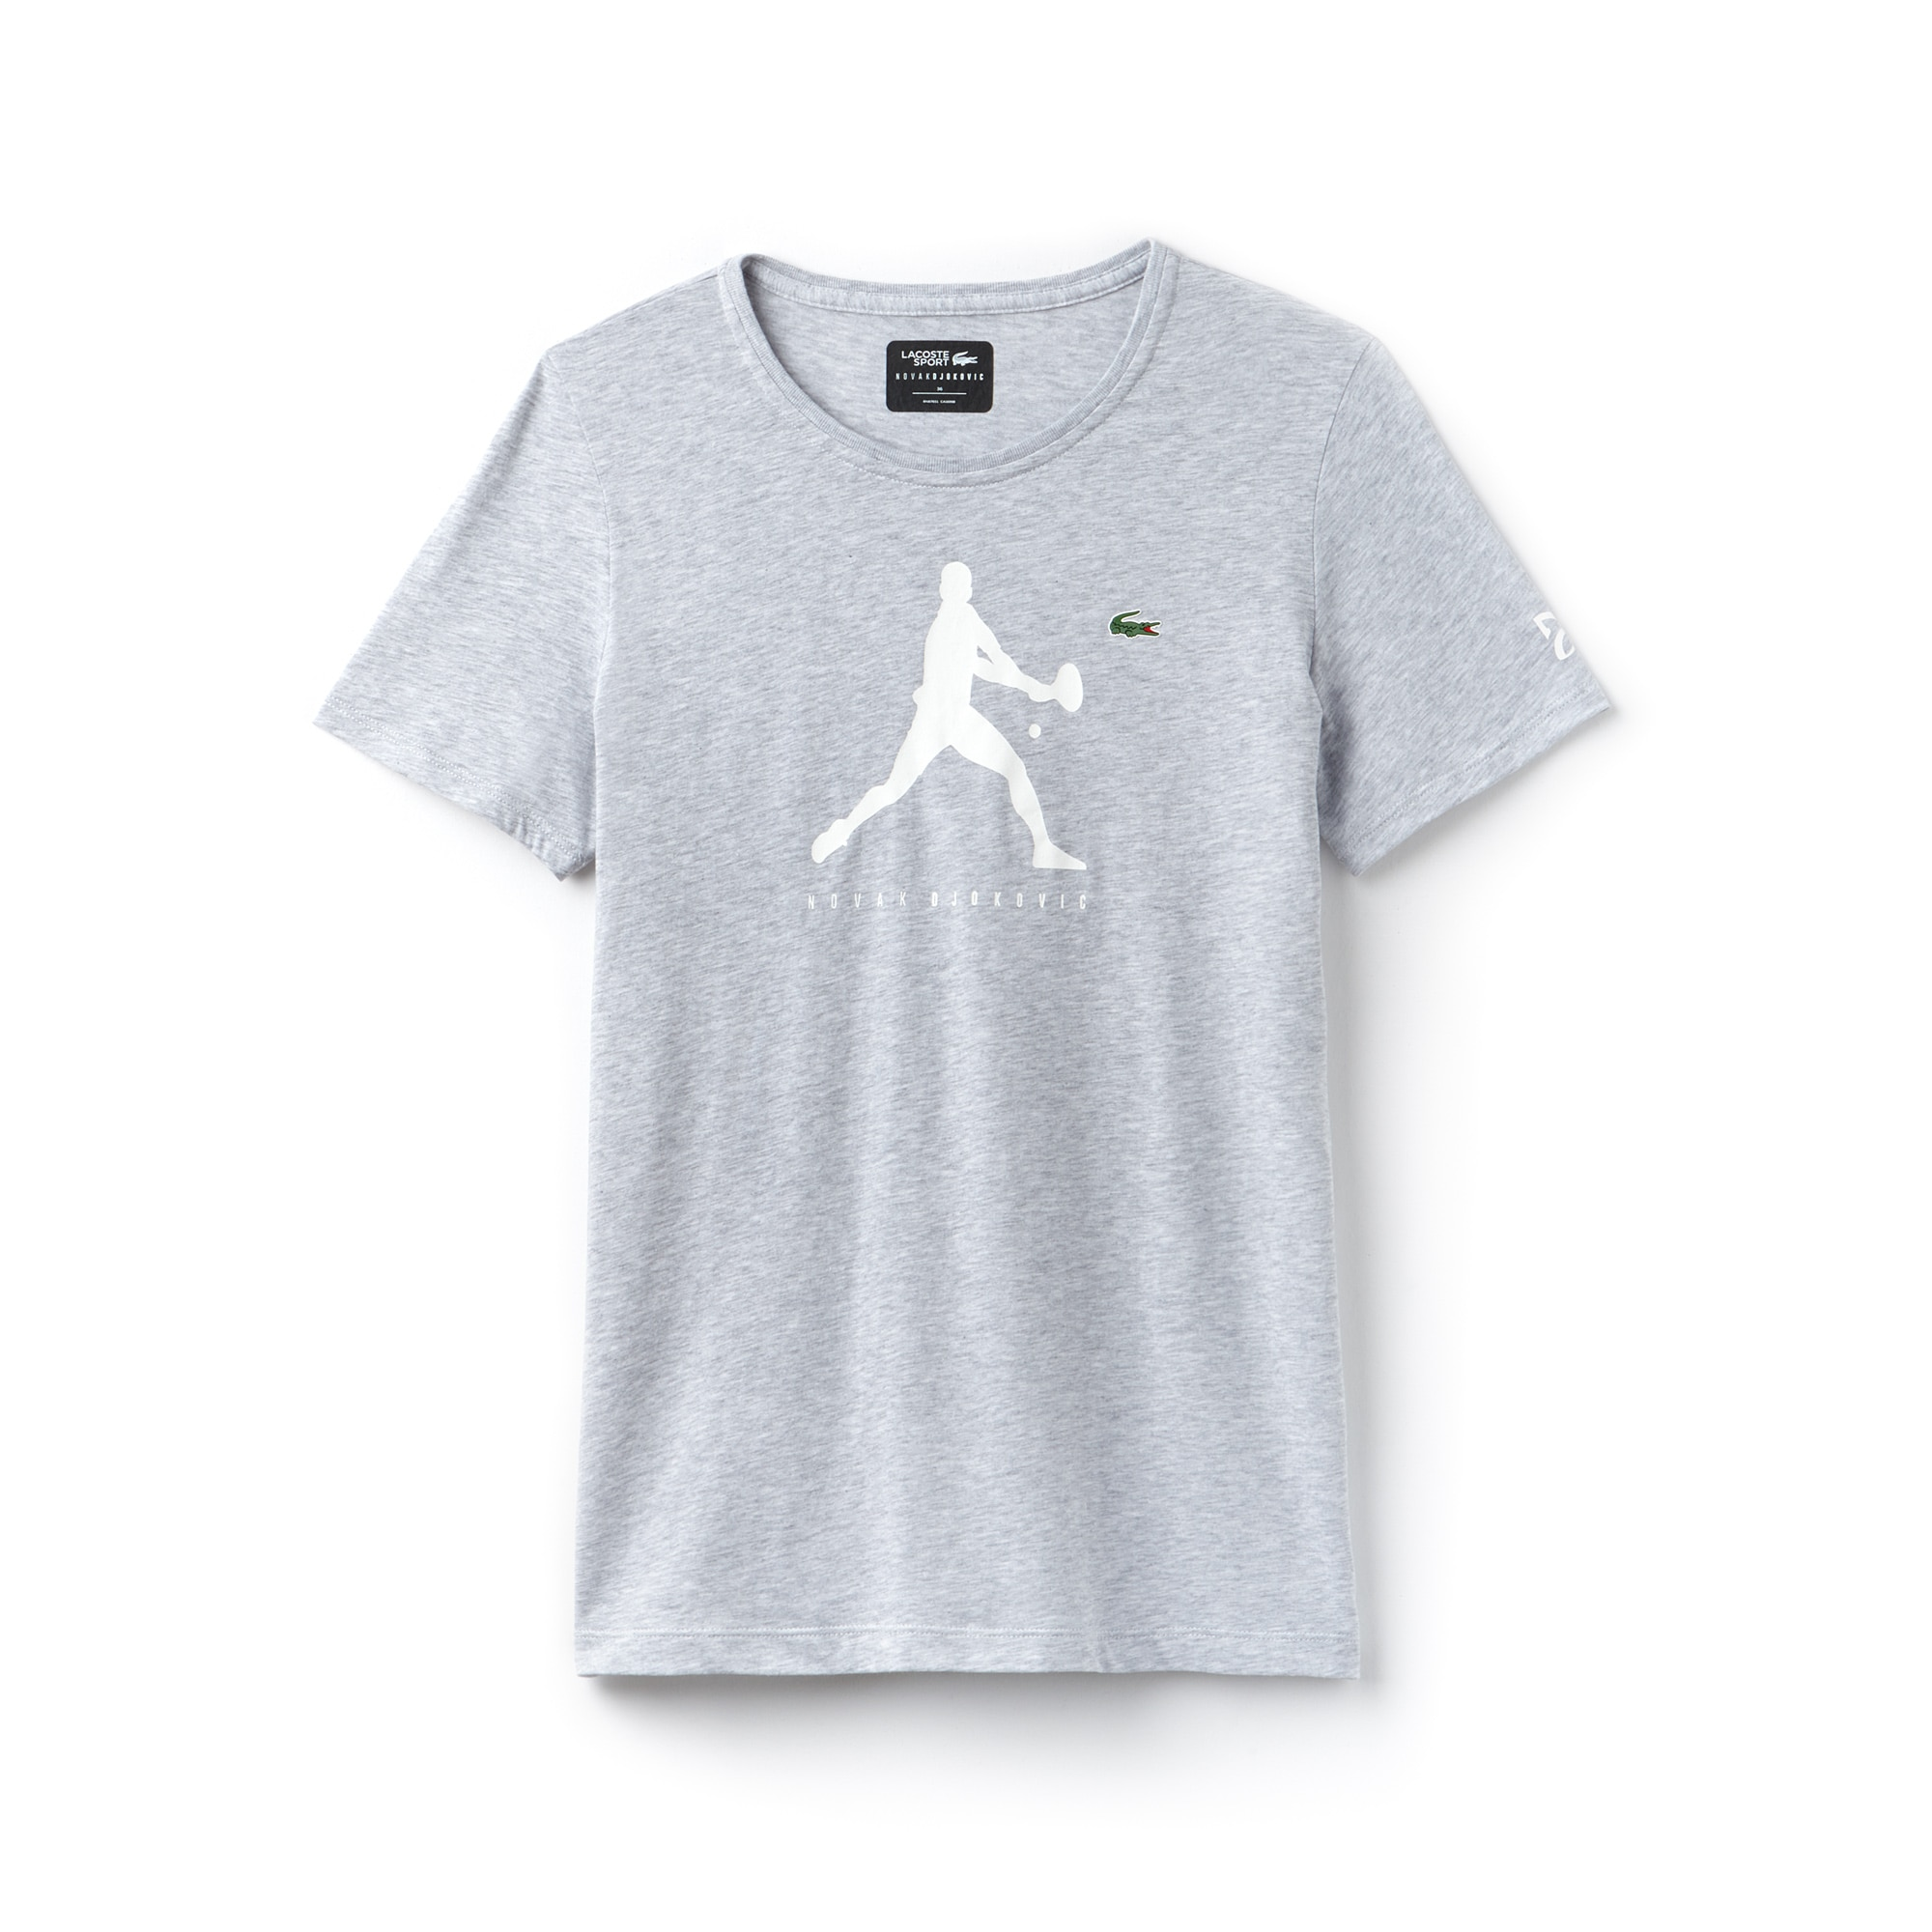 Women's SPORT Crew Neck Print Jersey T-shirt - Novak Djokovic Supporter Collection